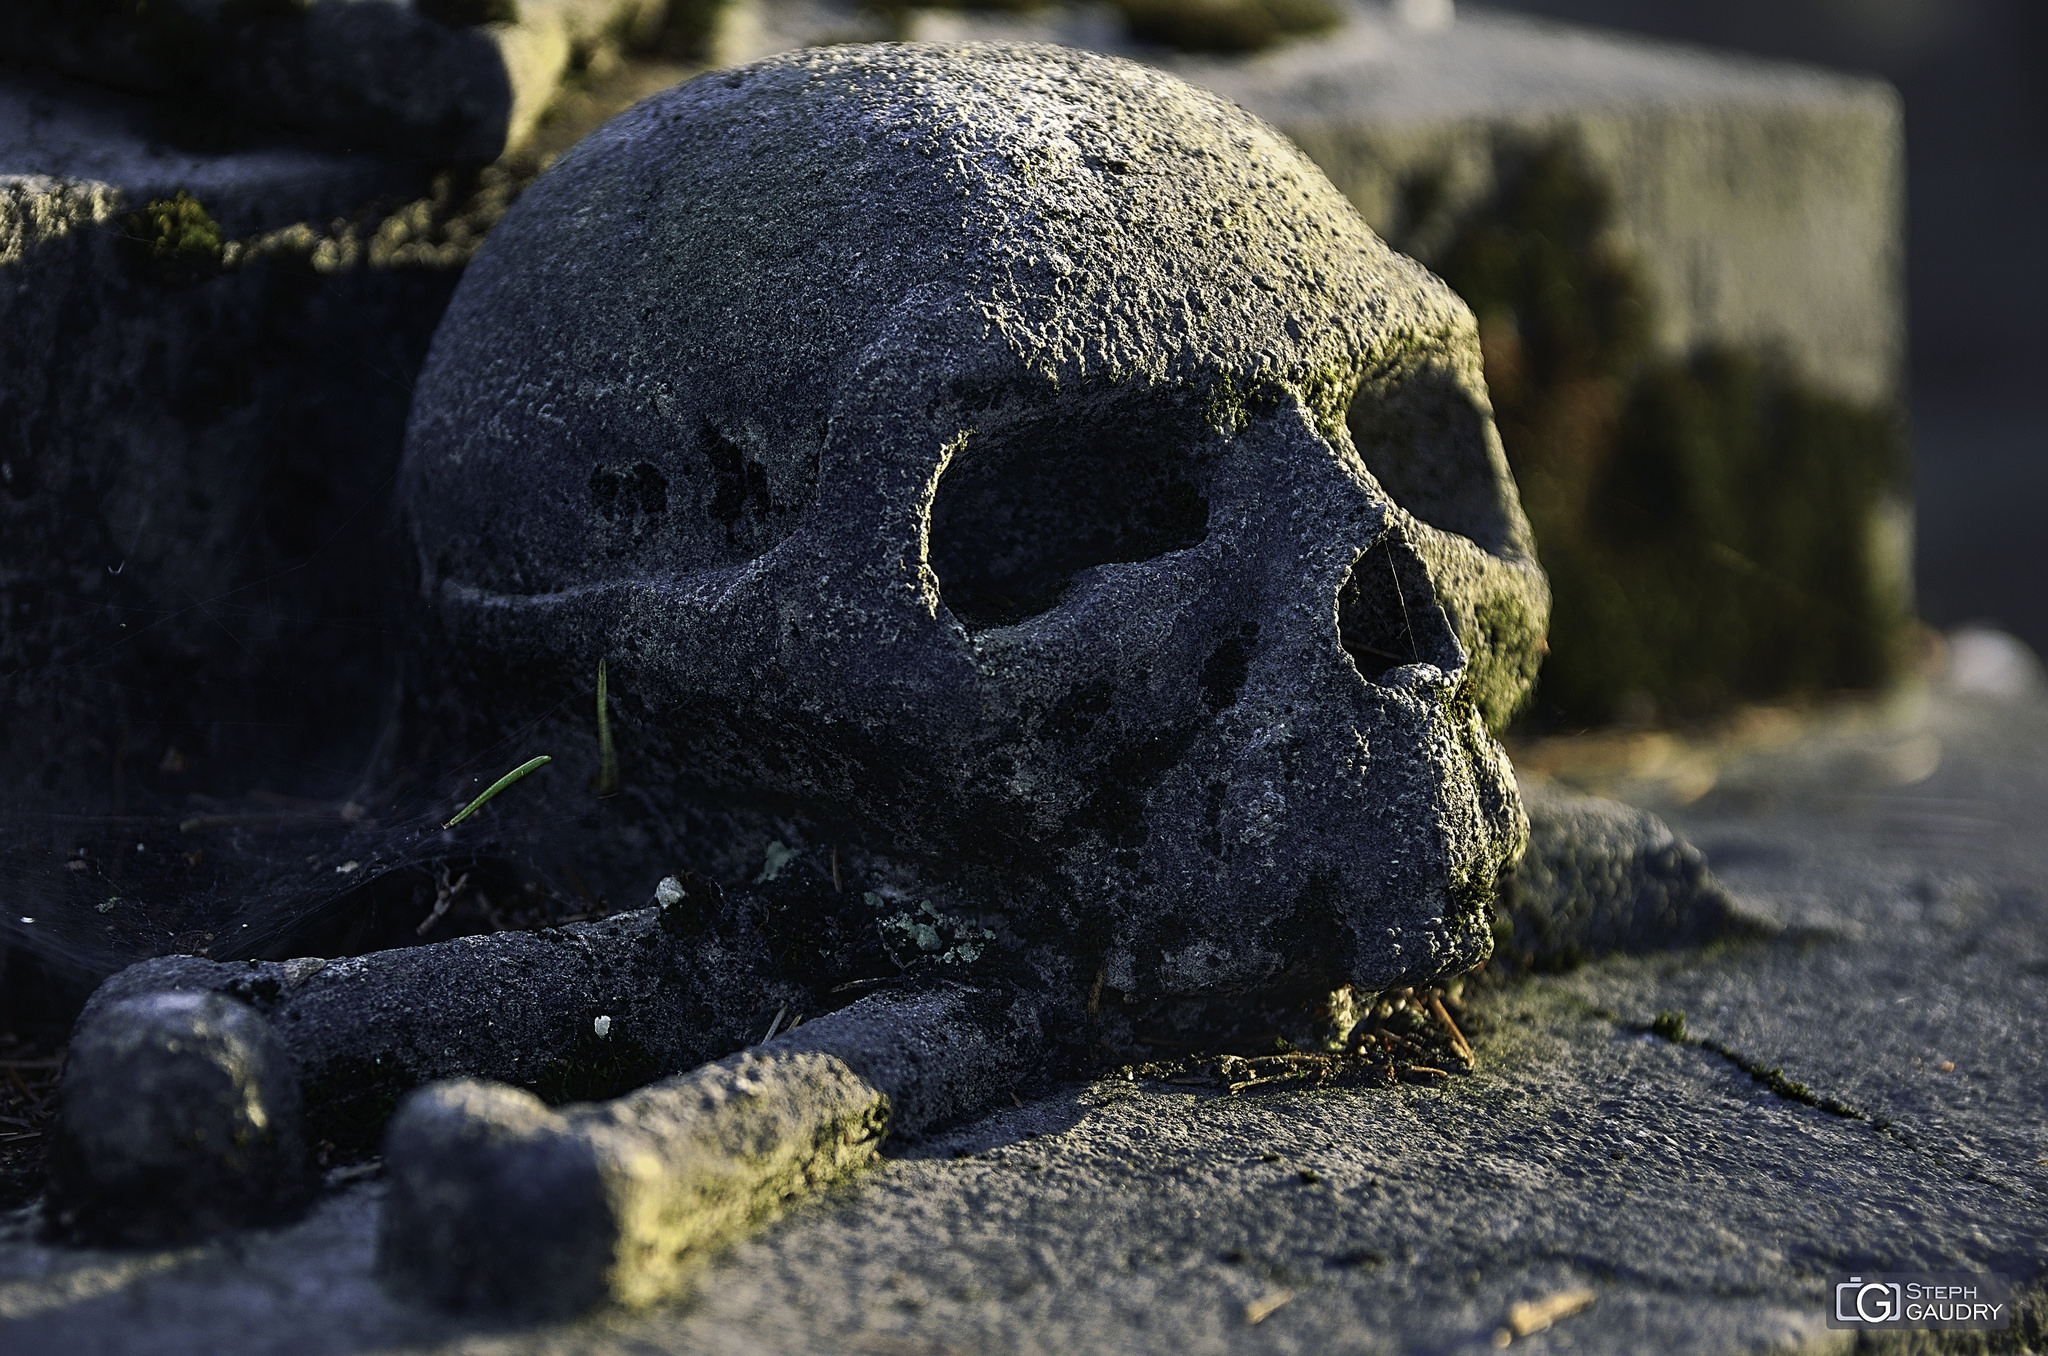 Caput-mortuum [Klik om de diavoorstelling te starten]